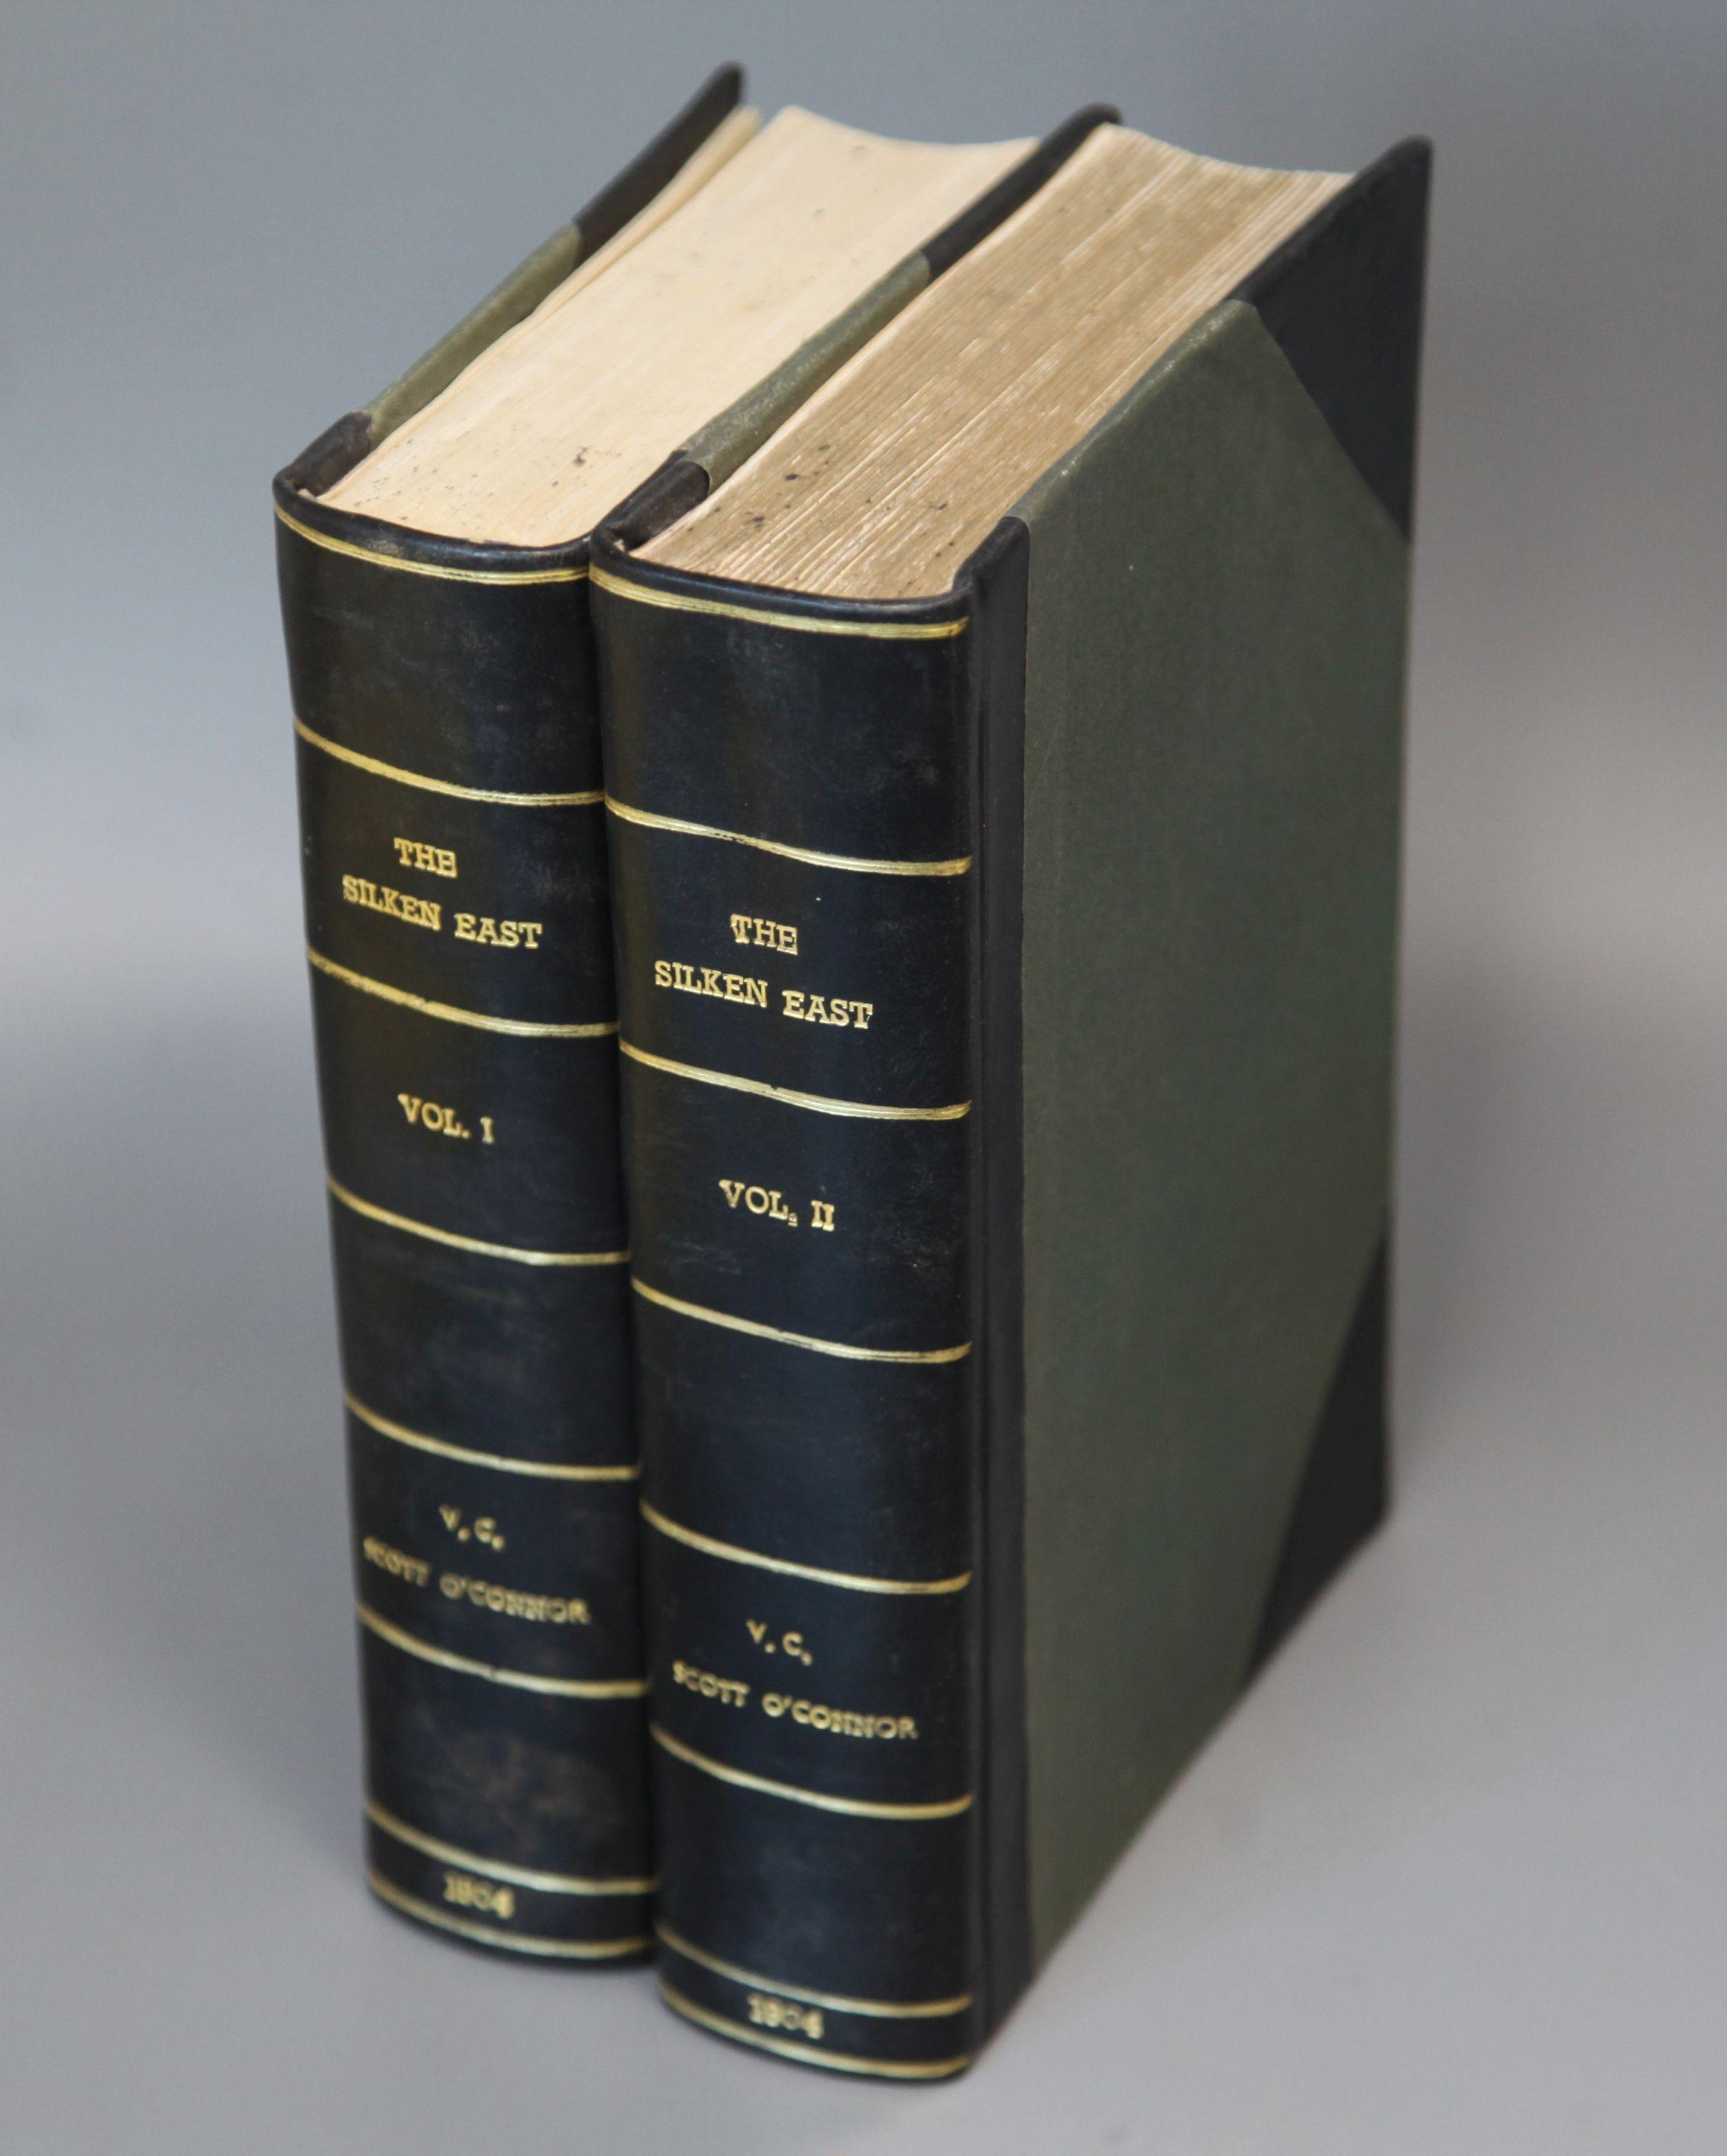 Lot 27 - O'Connor, Vincent Clarence Scott - The Silken East, 2 vols, rebound half calf, quarto, front inner